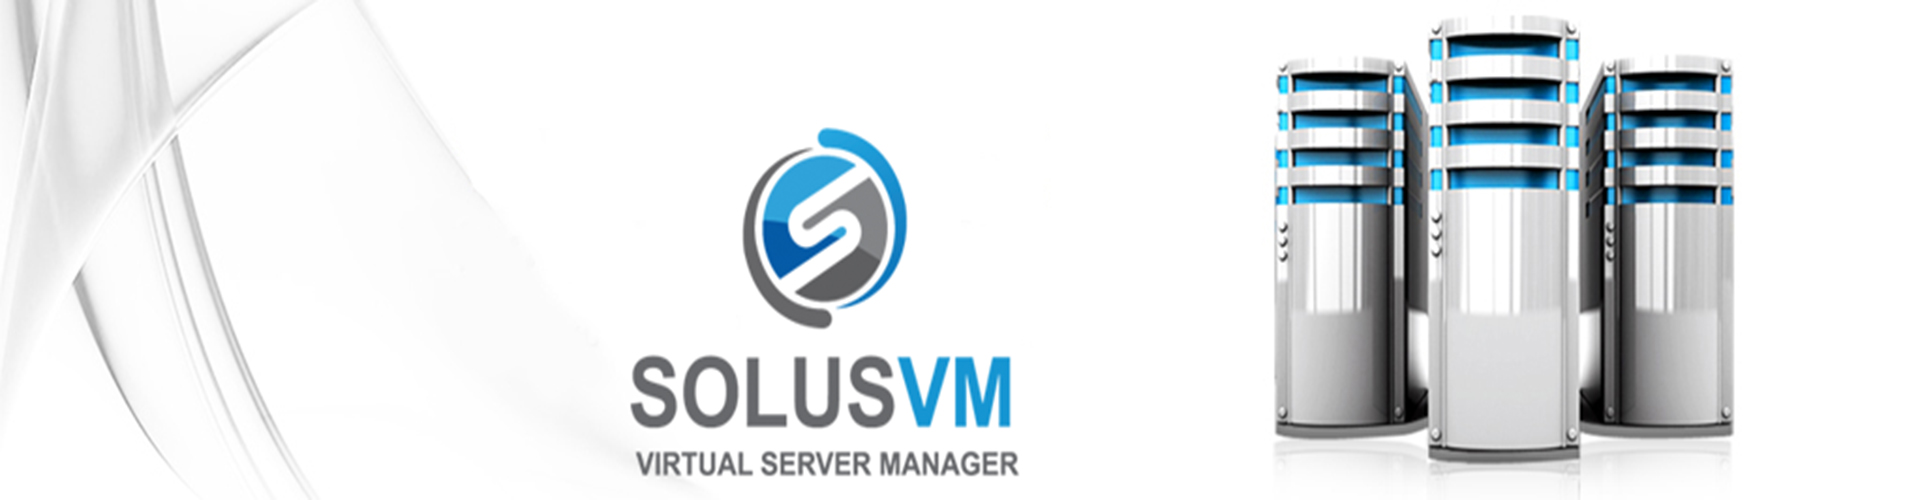 SolusVM چیست؟